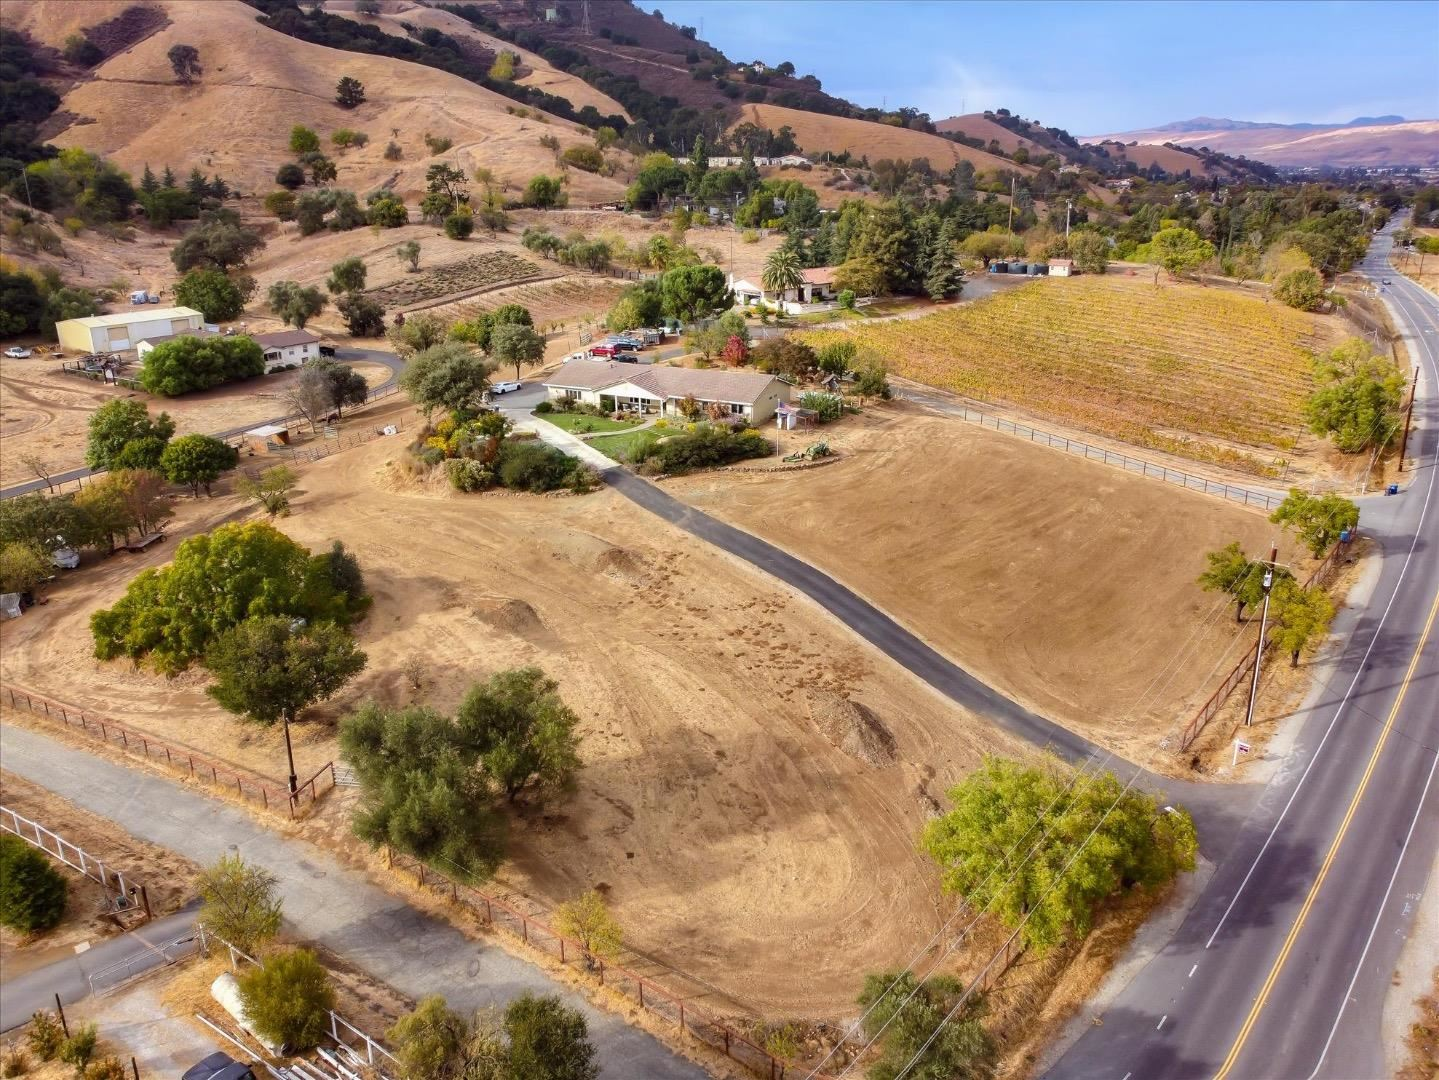 Photo for 16425 De Witt AVE, MORGAN HILL, CA 95037 (MLS # ML81820600)